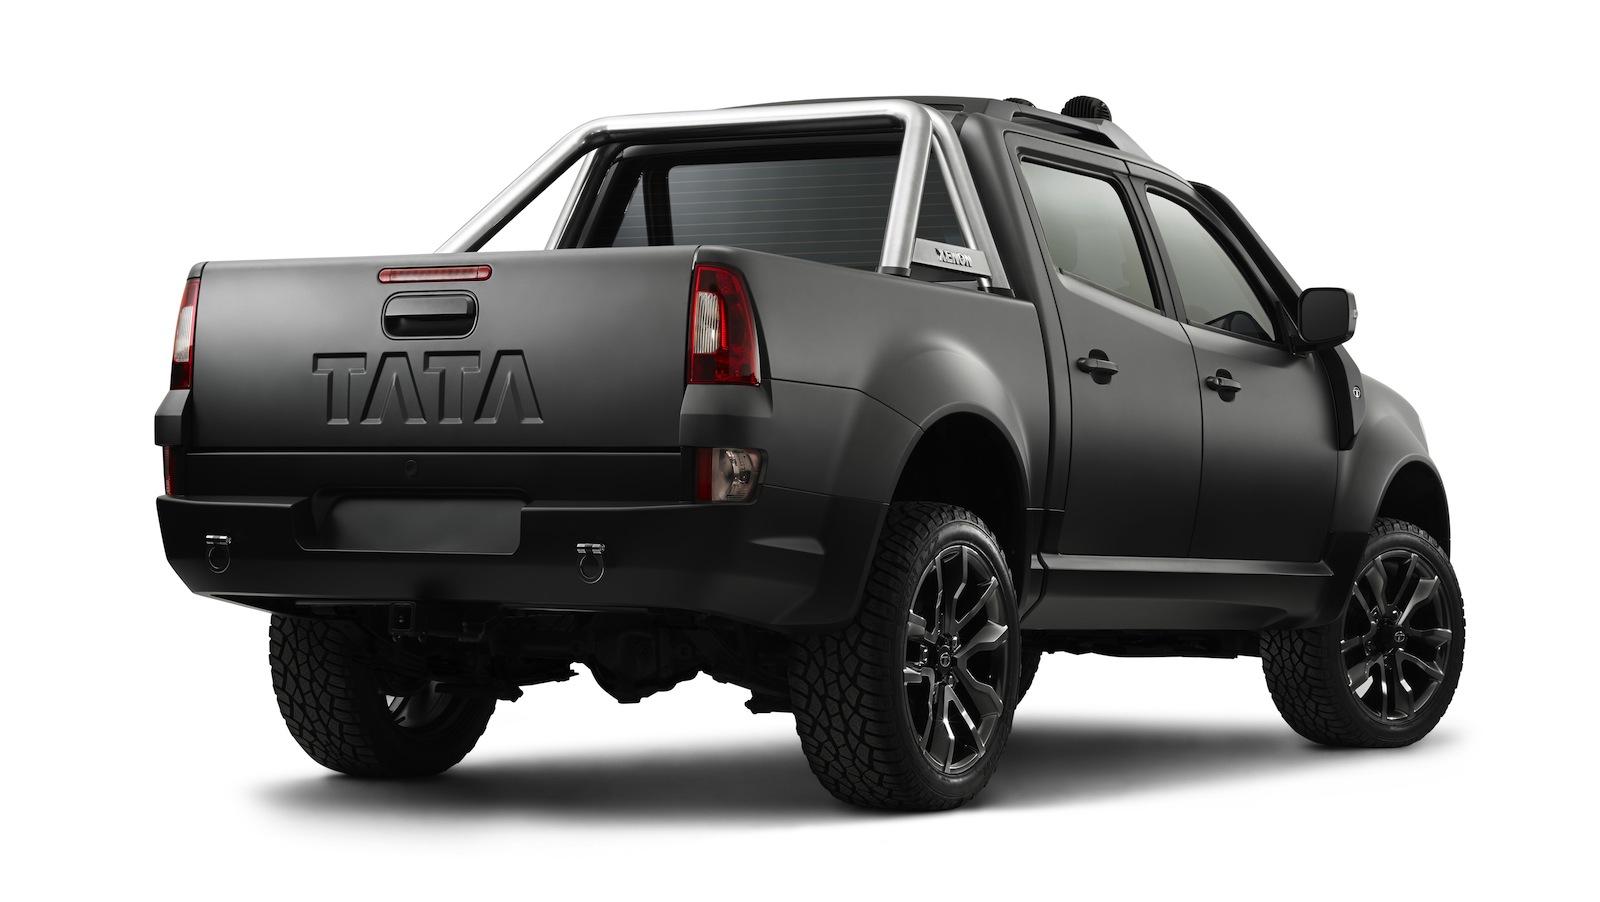 Drive Now Truck Sales >> Tata Xenon Tuff Truck: Australian-designed ute concept revealed - photos | CarAdvice